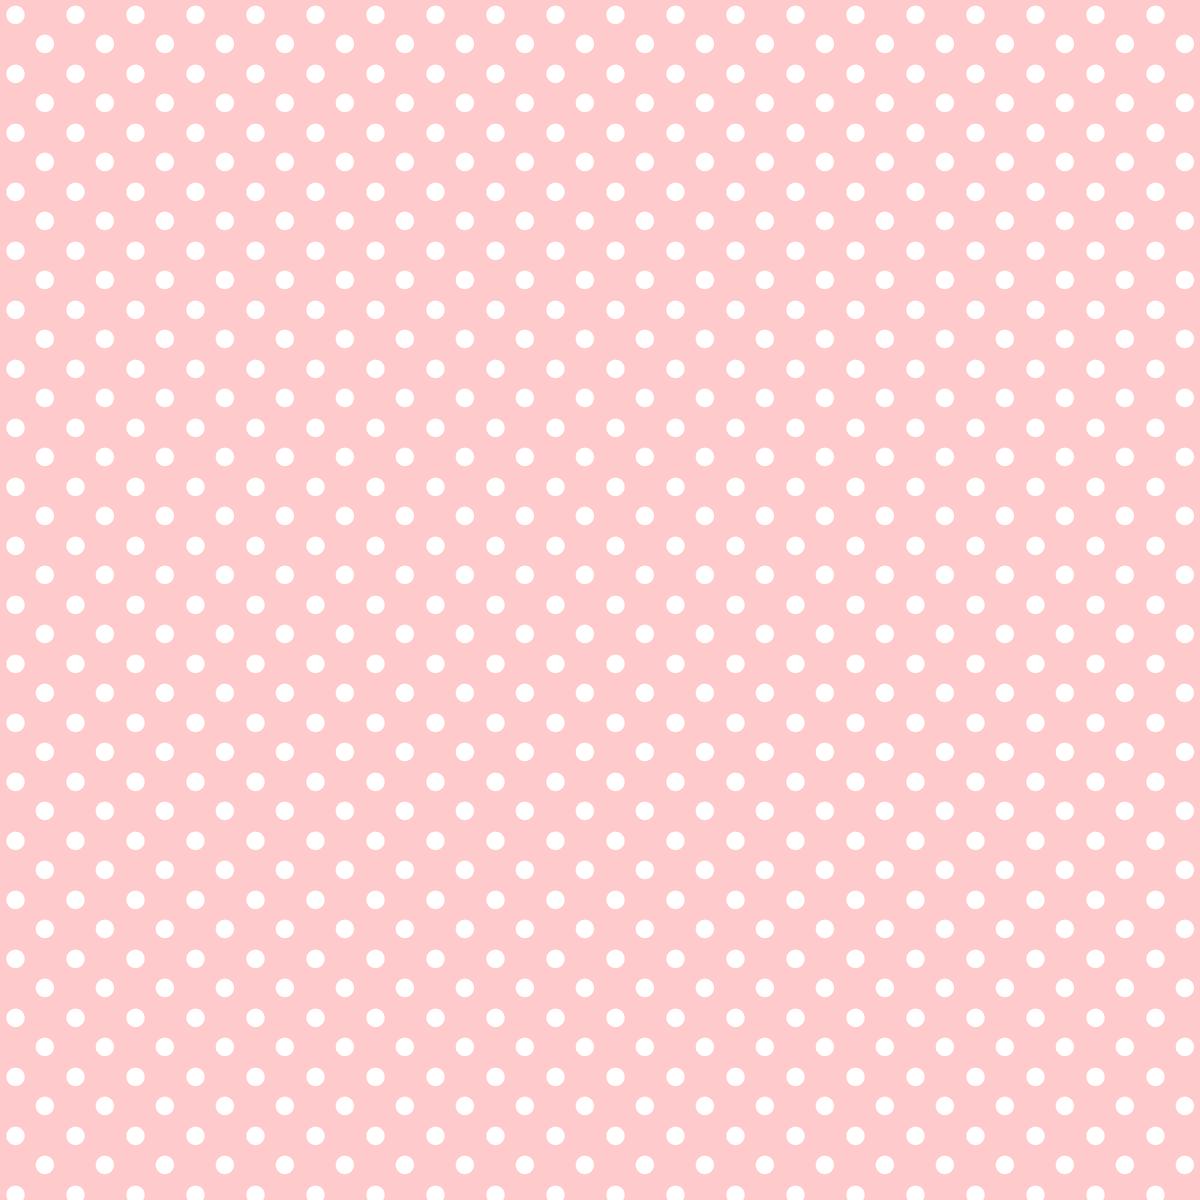 La Vie En Rose Free Printable Digital Scrapbooking Paper Polka Dot Butterfly Plaid And L Pink Polka Dots Background Scrapbook Paper Polka Dot Background